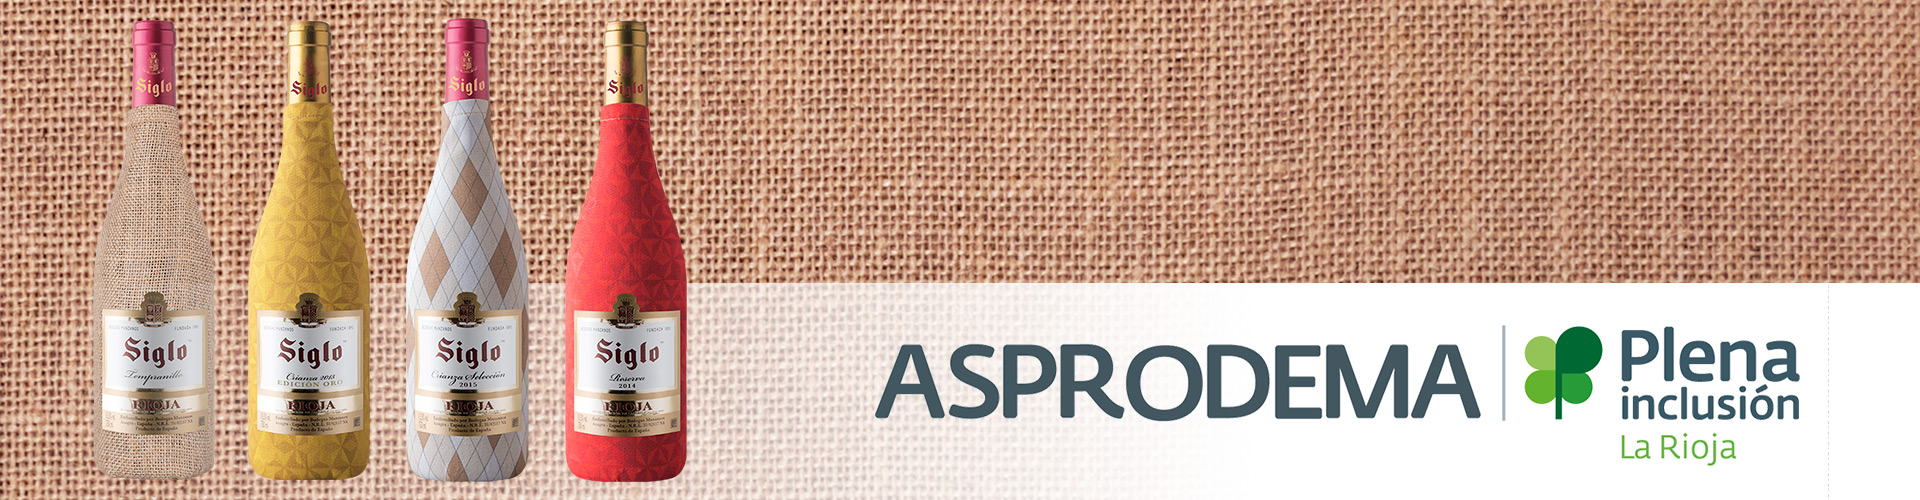 asprodema-banner